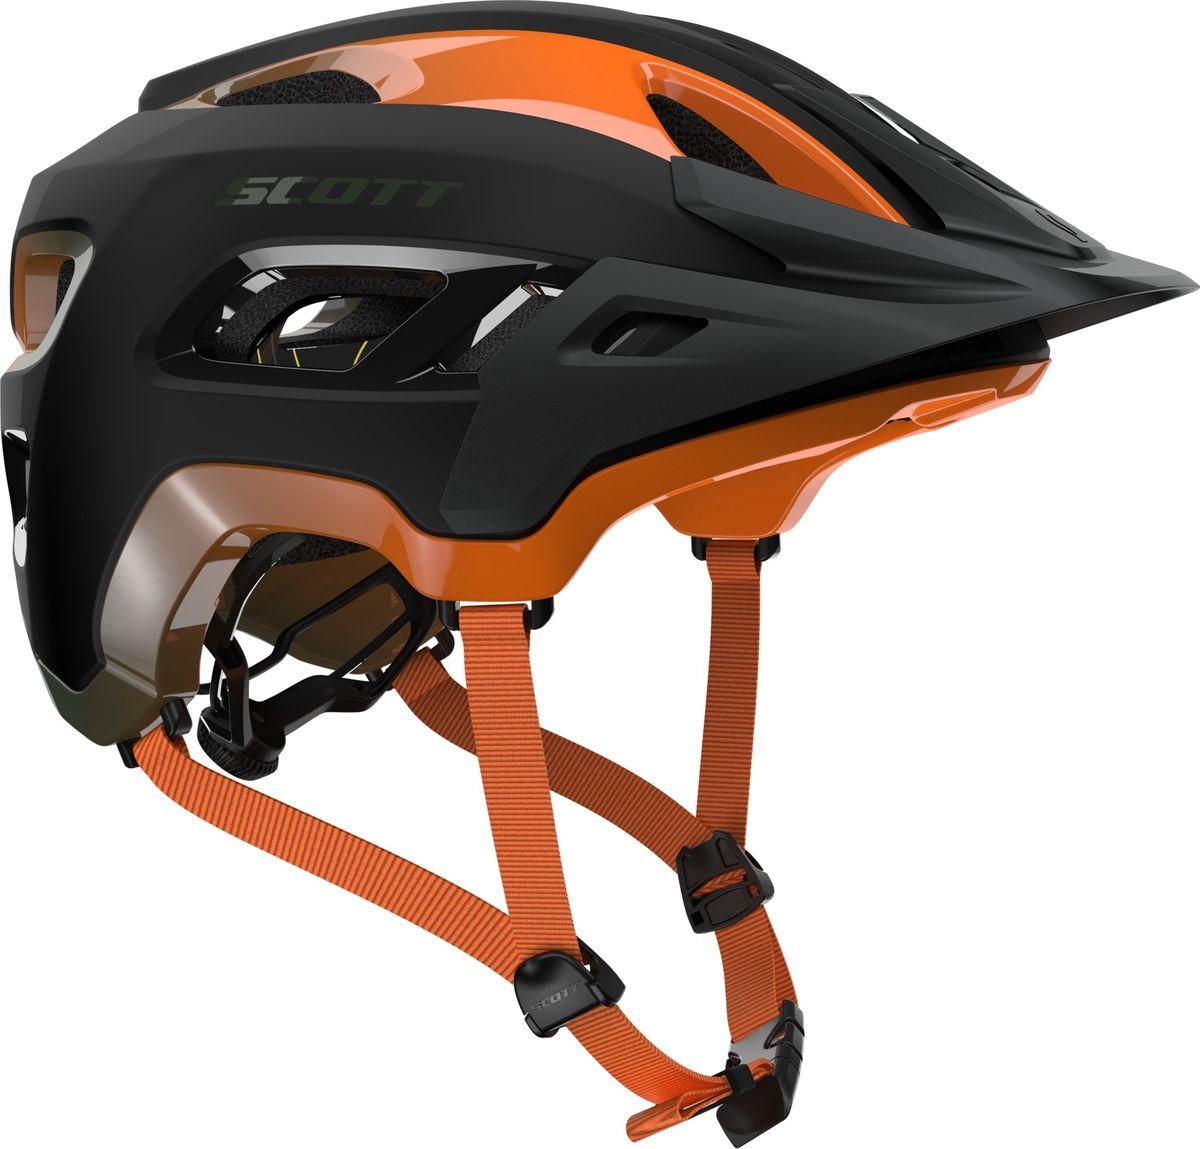 Шлем защитный Scott Stego, 227640-6154, оранжевый, размер M (55/59)